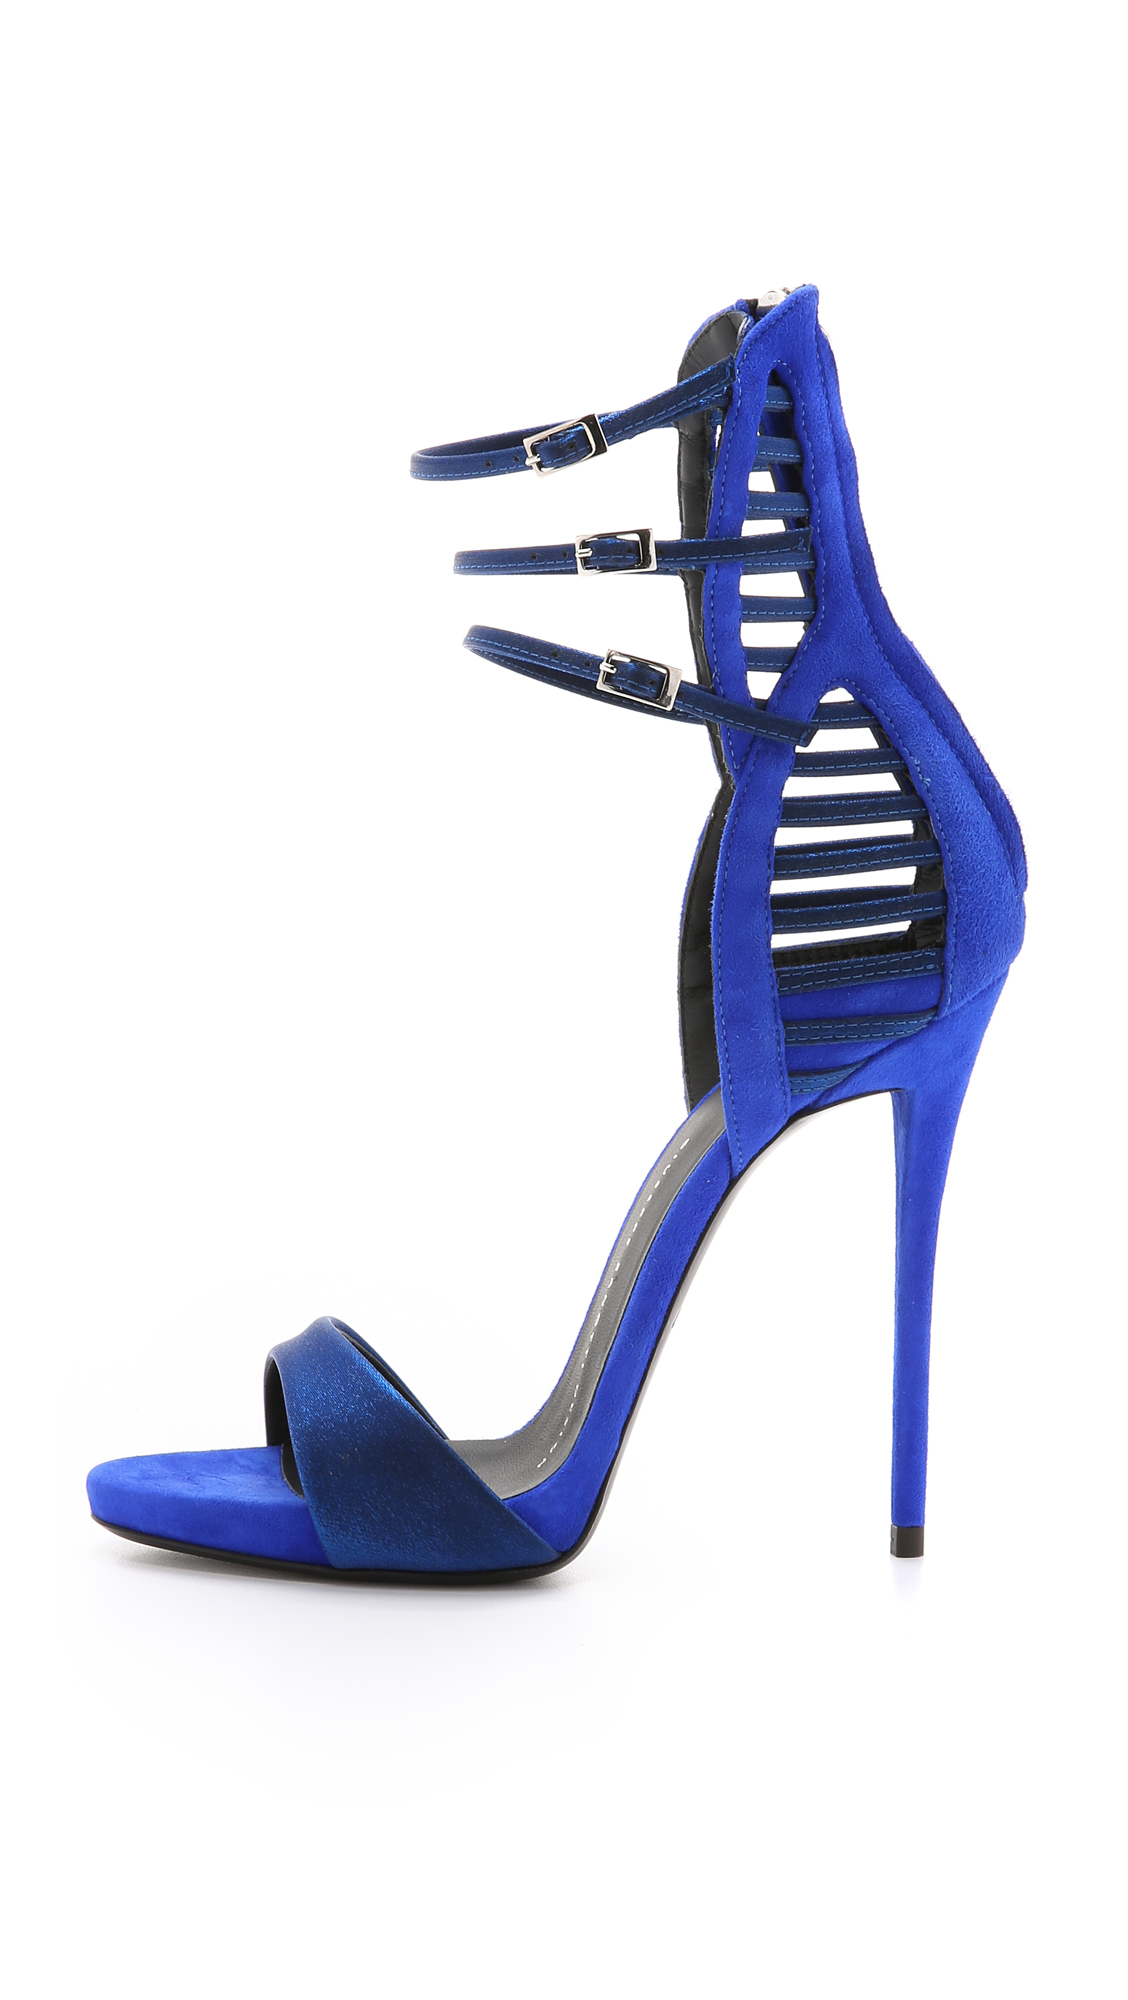 giuseppe zanotti blue suede cut out heels